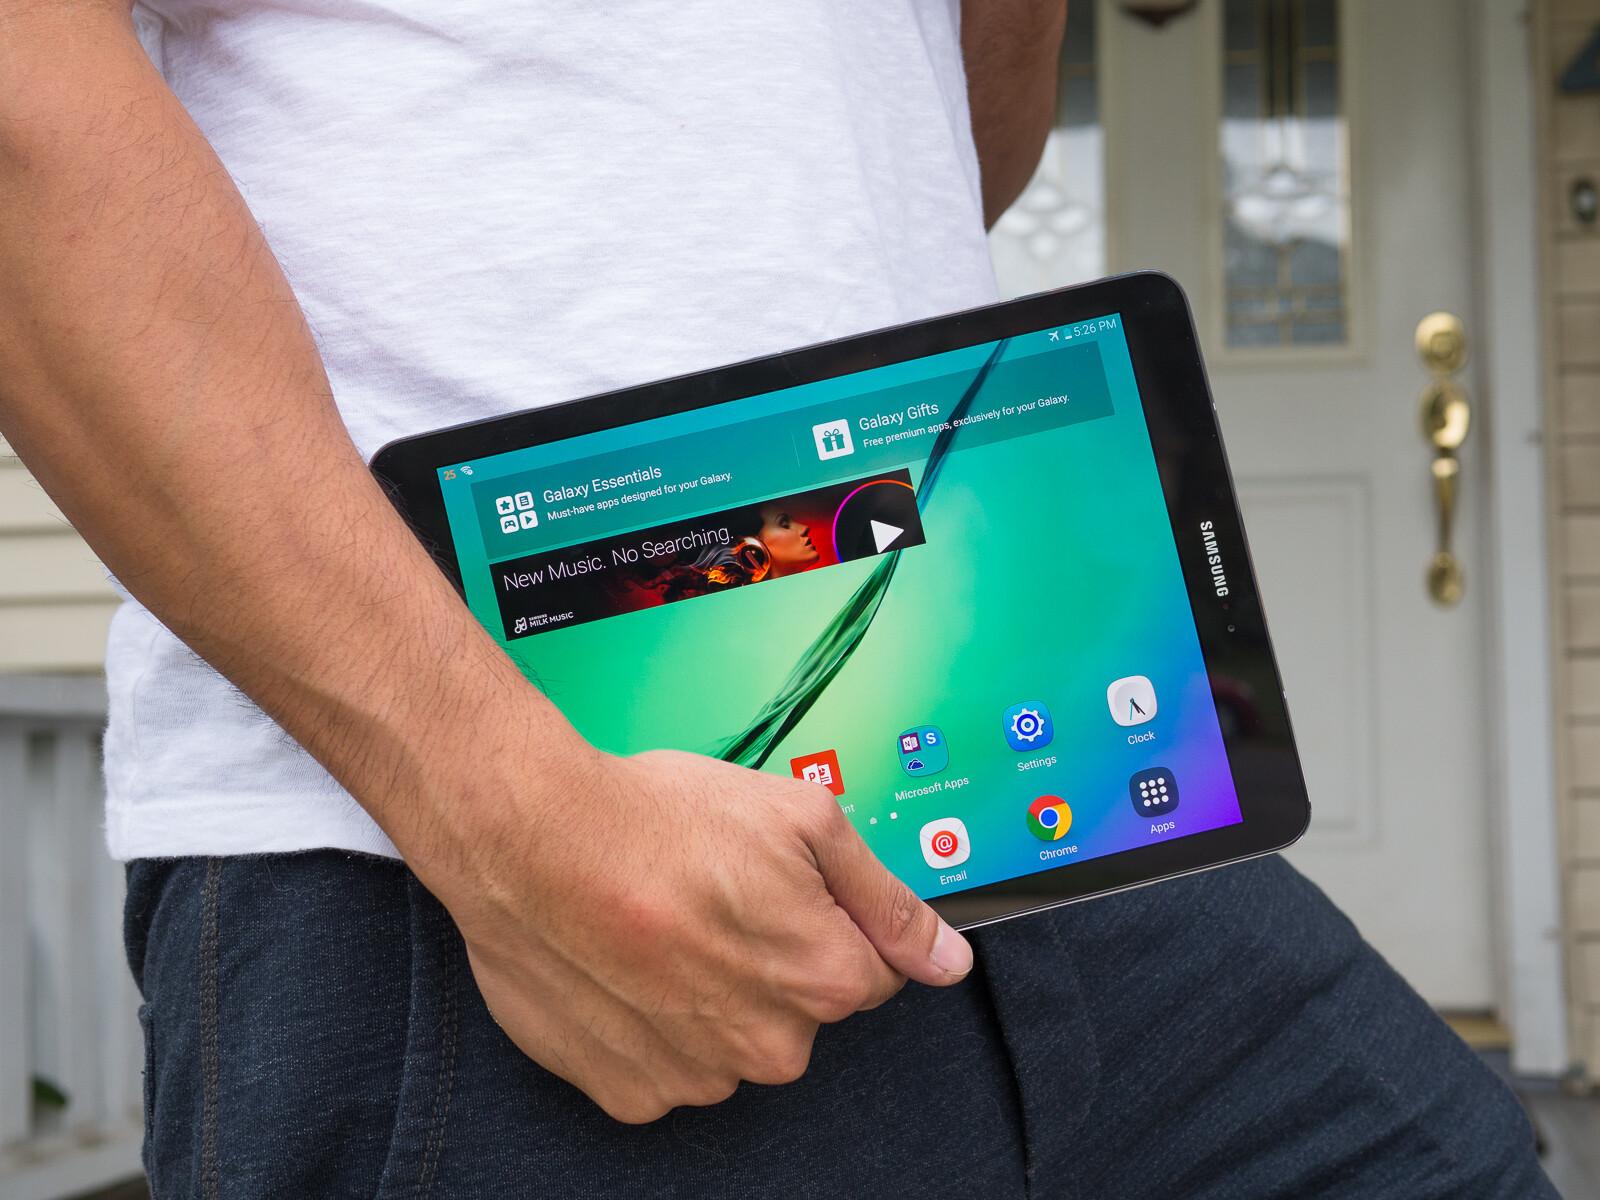 Samsung Galaxy Tab S2 9.7-inch